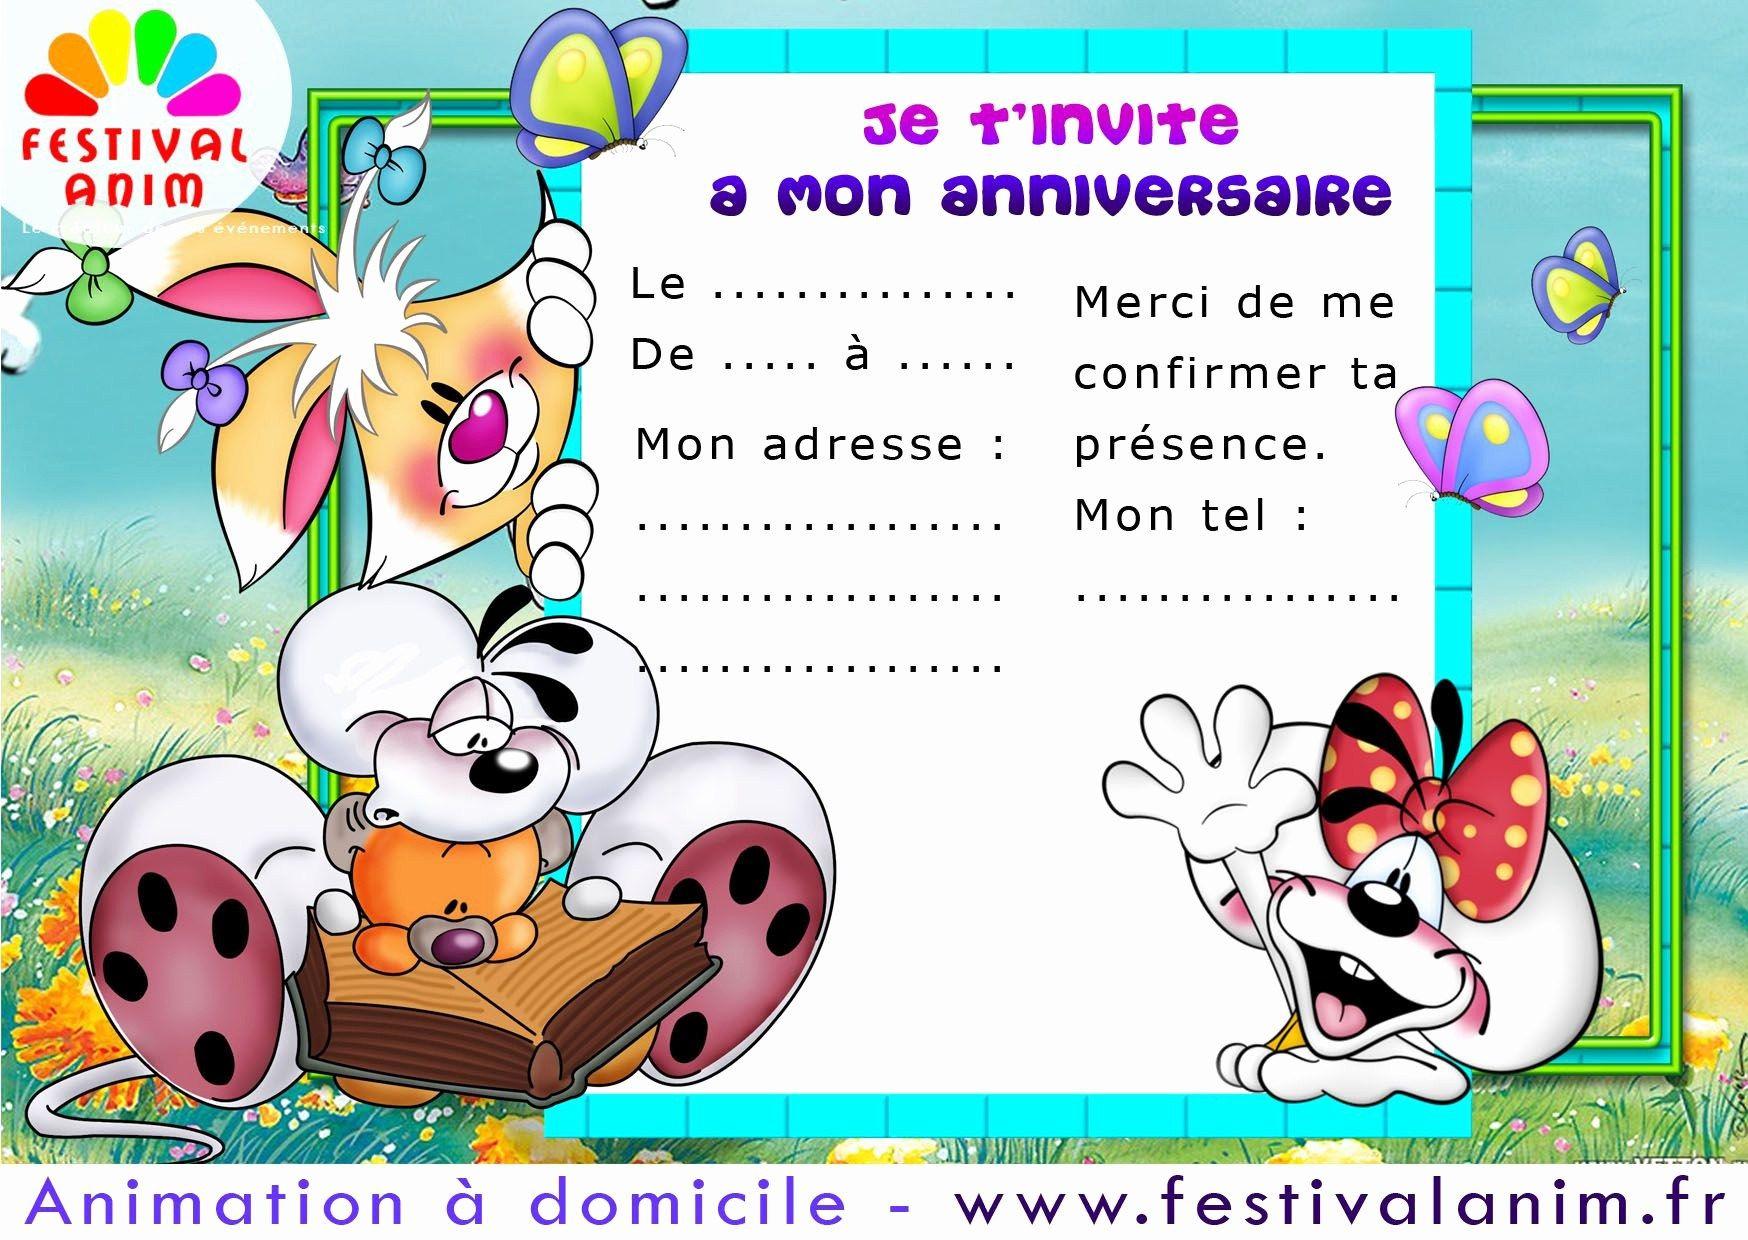 d invitation anniversaire gratuite